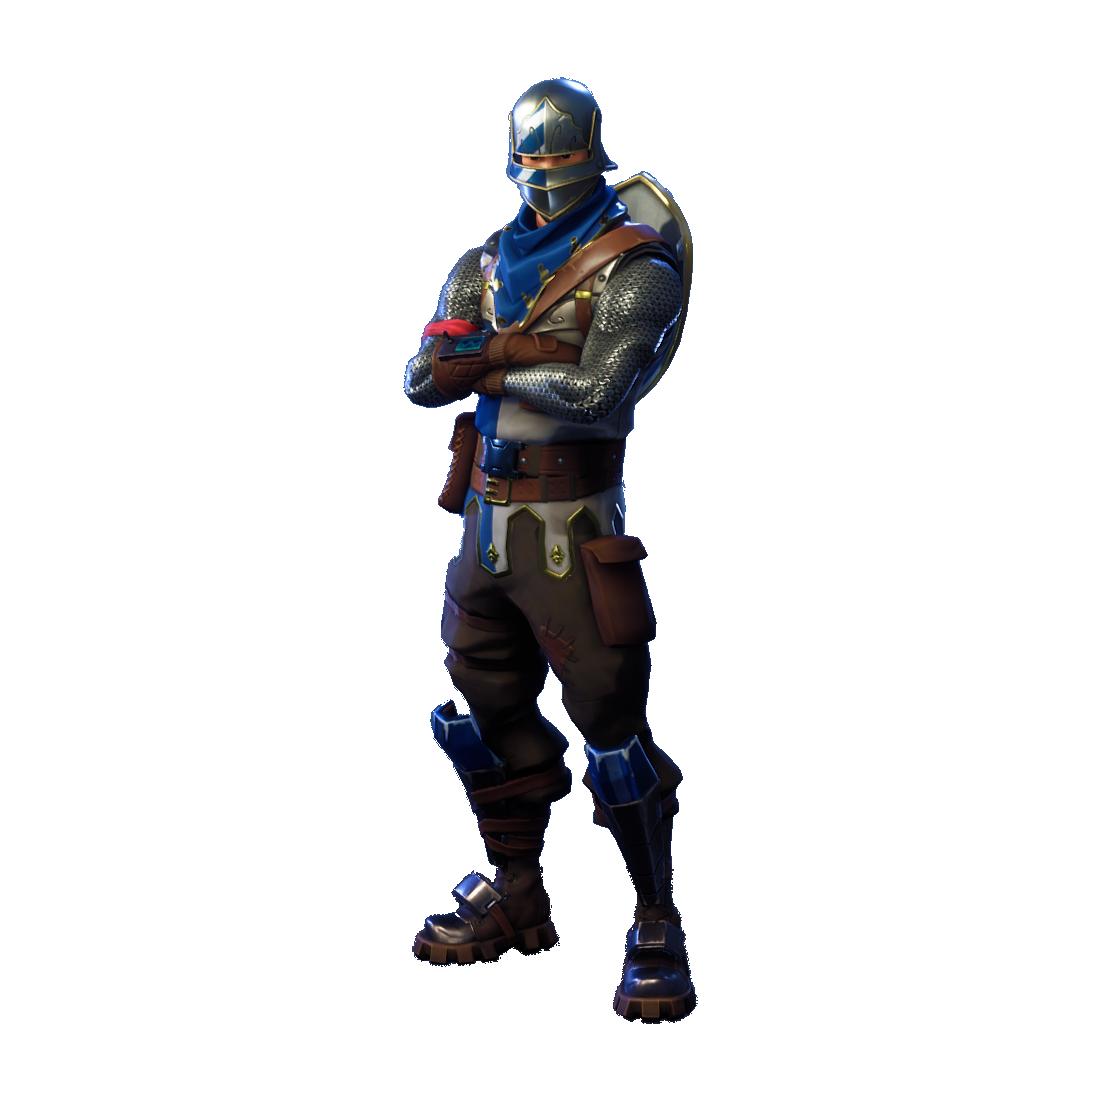 Blue Squire - Синий оруженосец (Blue Squire)